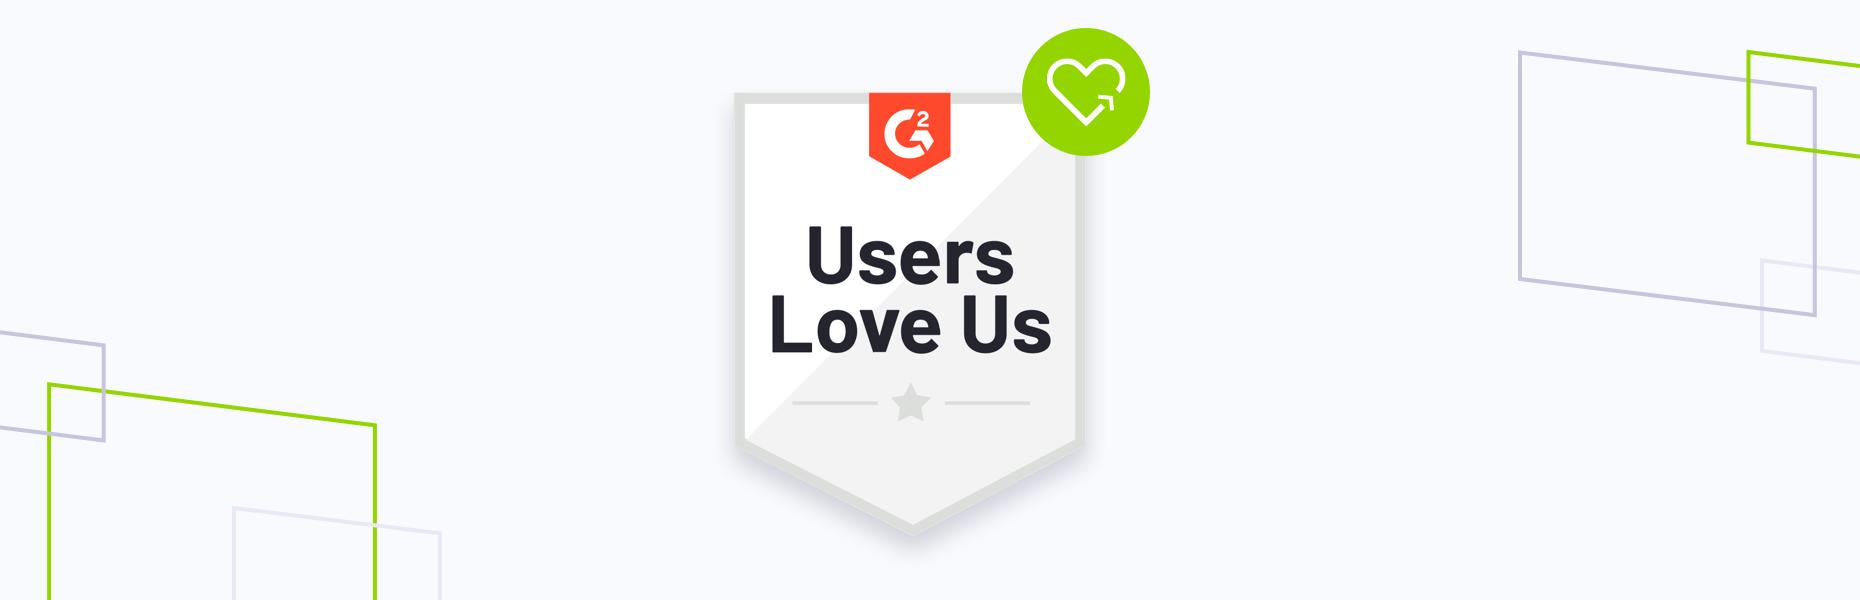 G2 fall badge, users love us